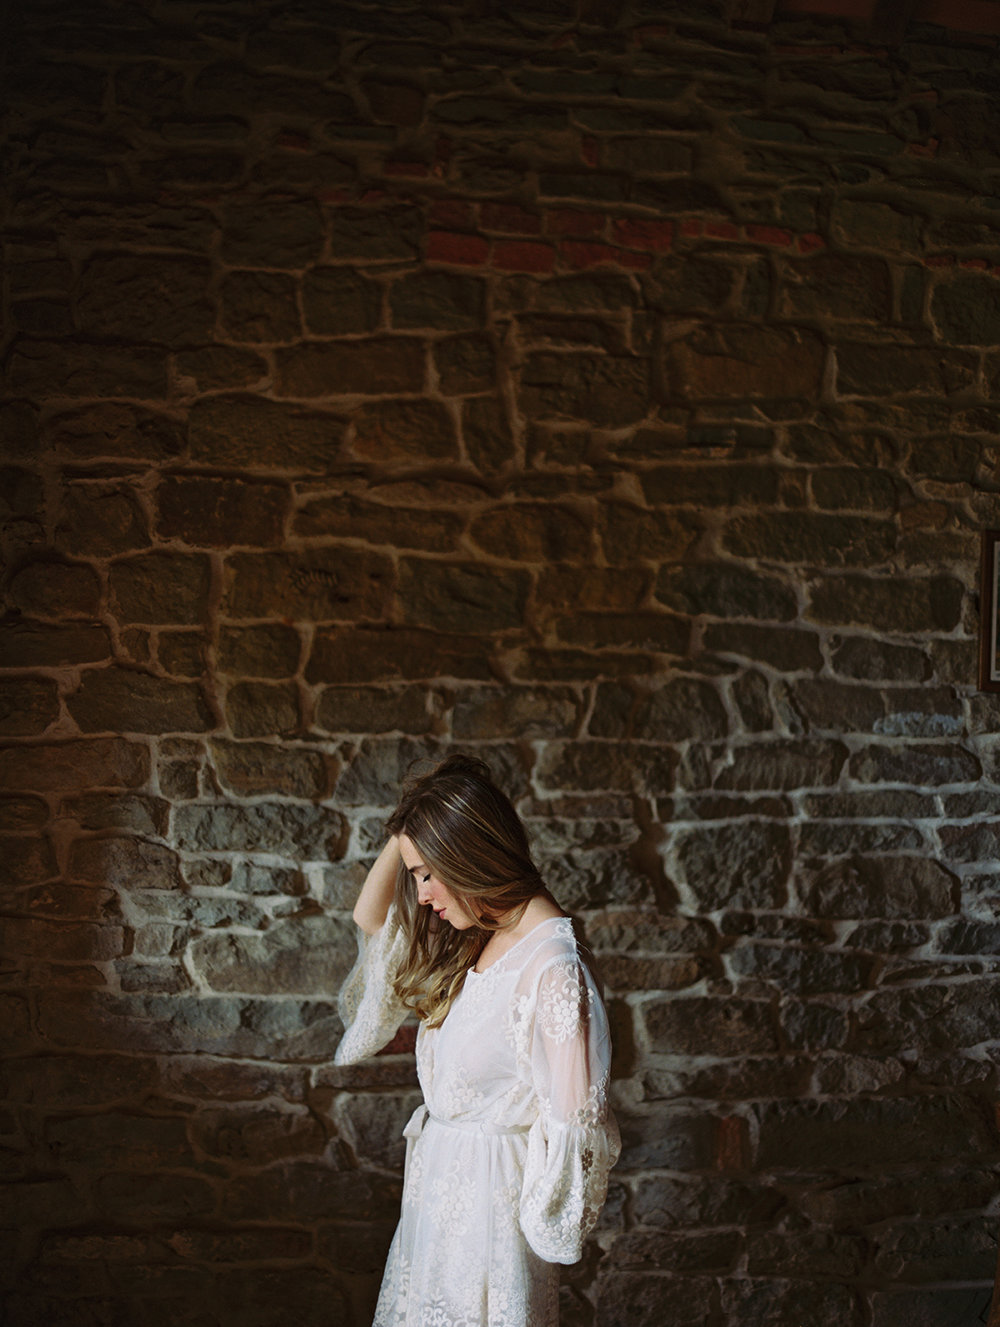 Eli-Savannah-Wedding-Italy-Brumley-Wells-Photography-063.jpg